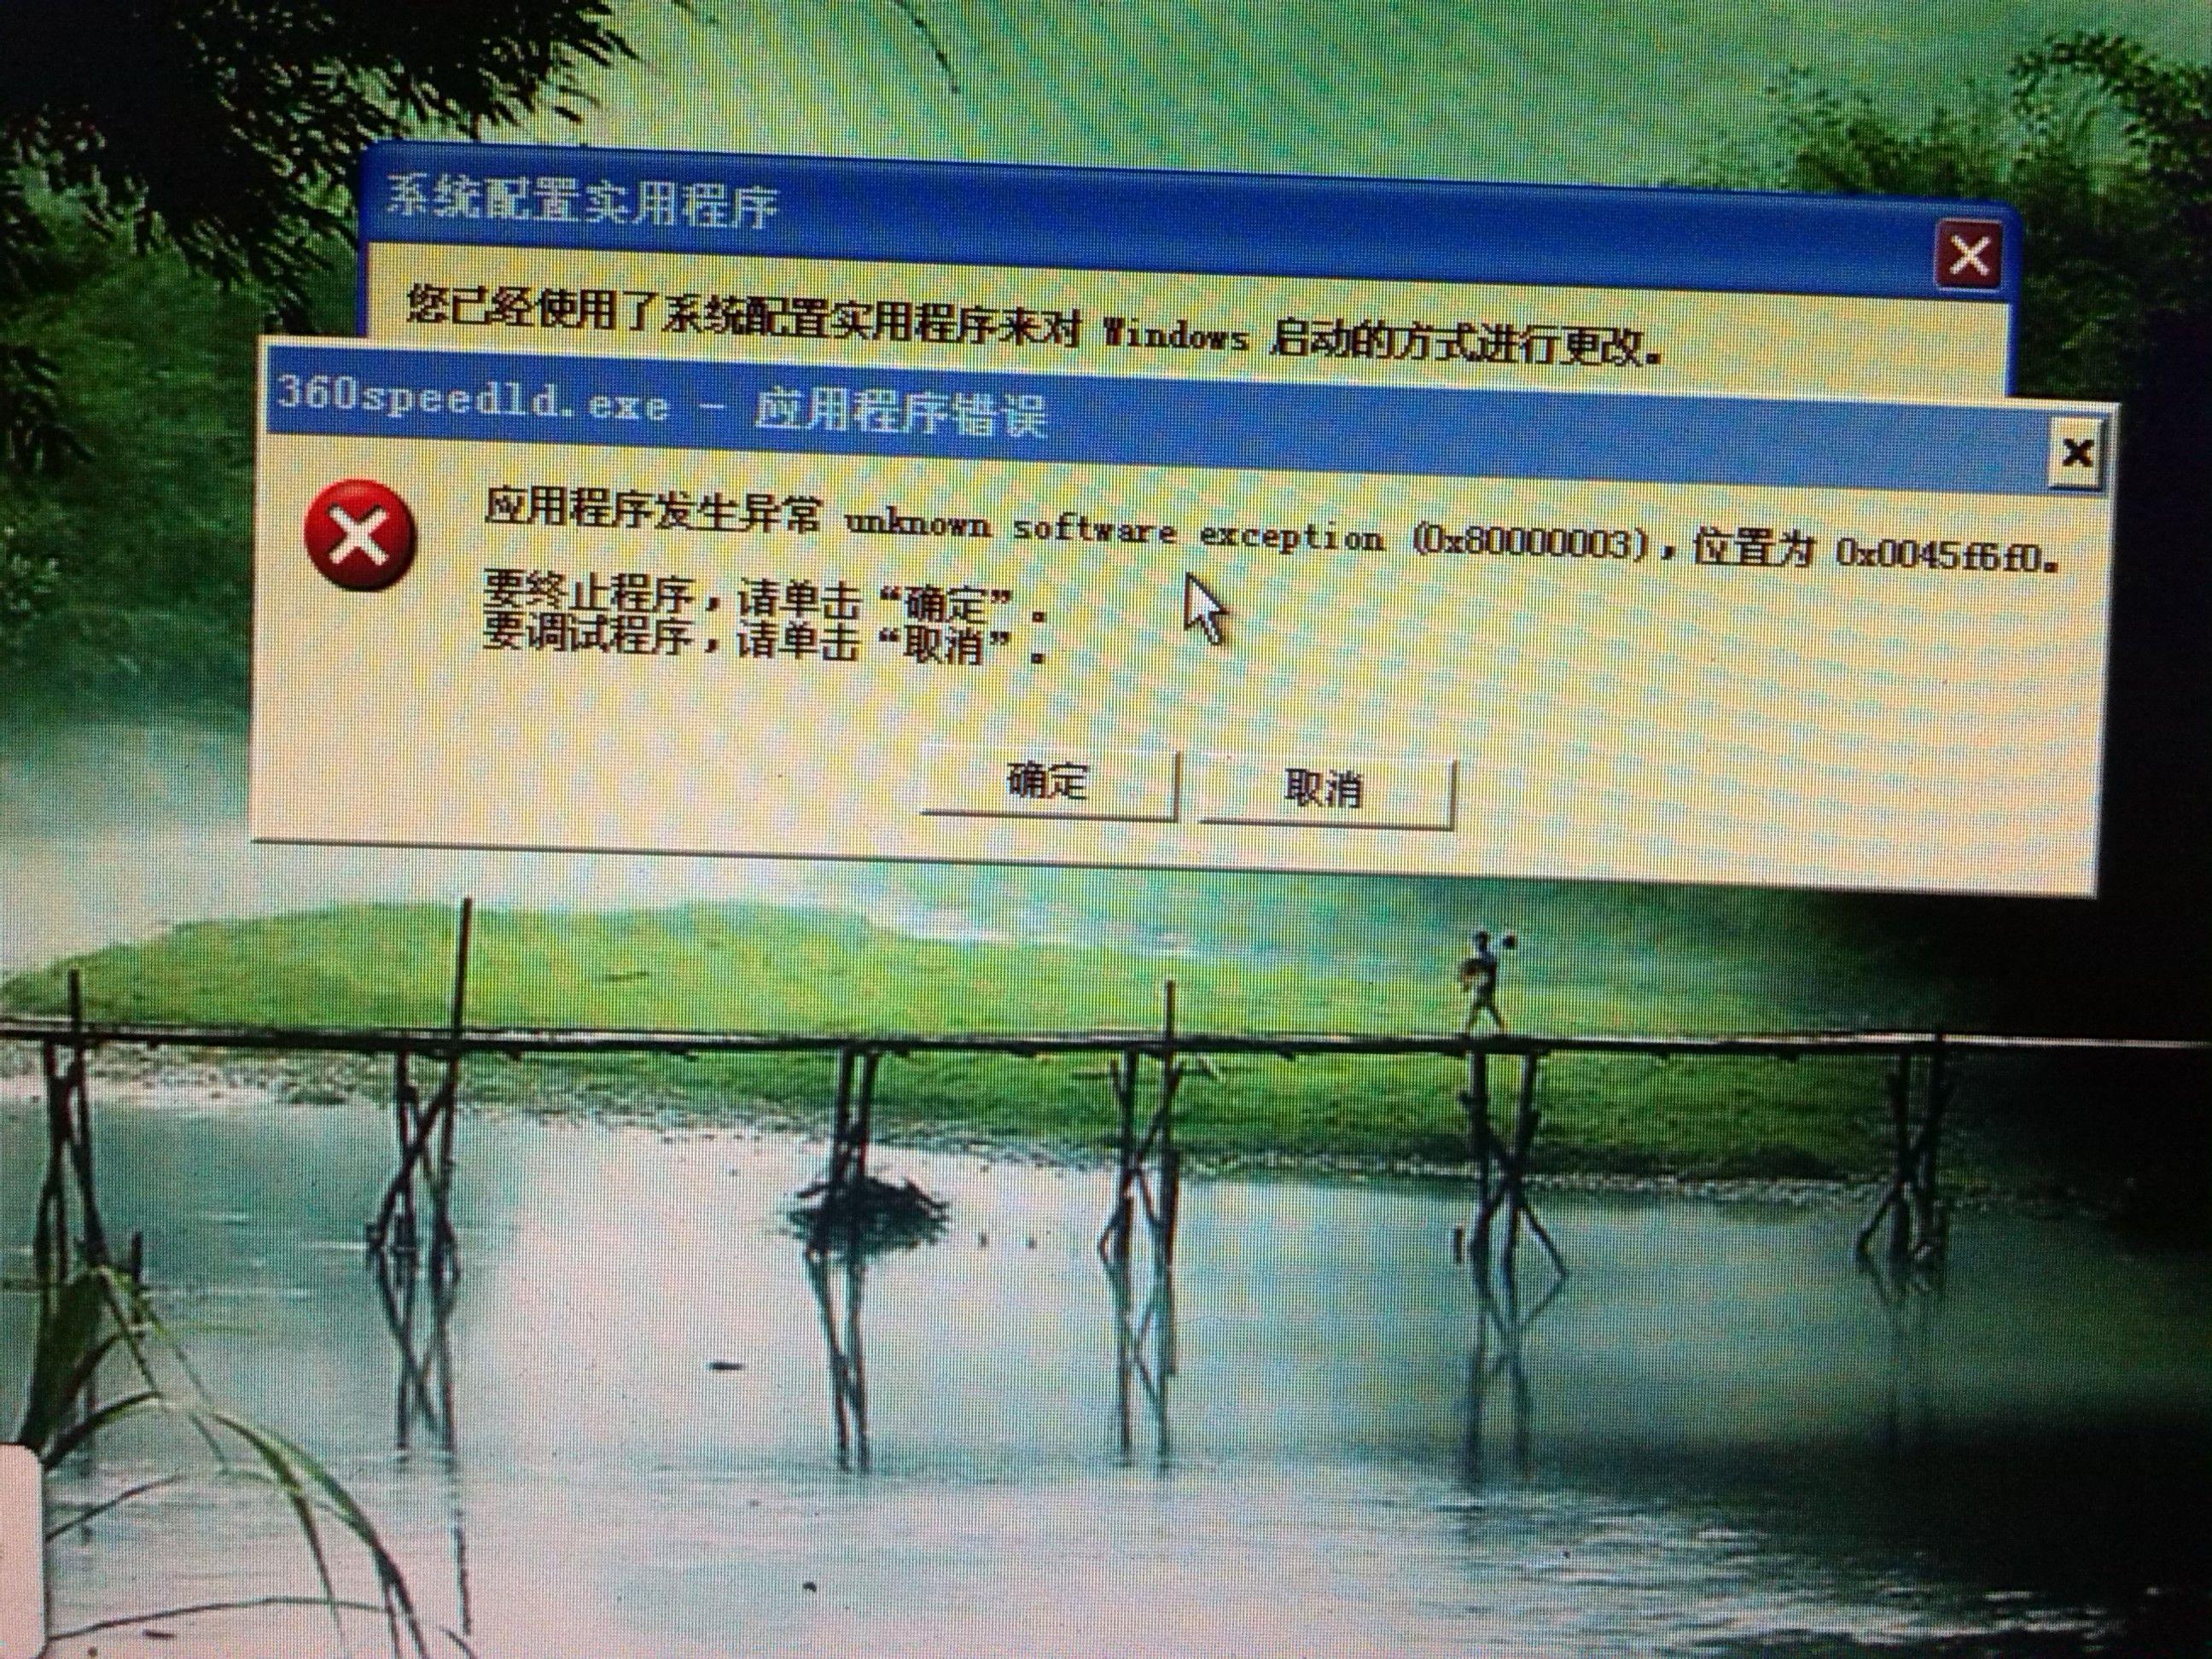 360speedld.exe 应用程序错误